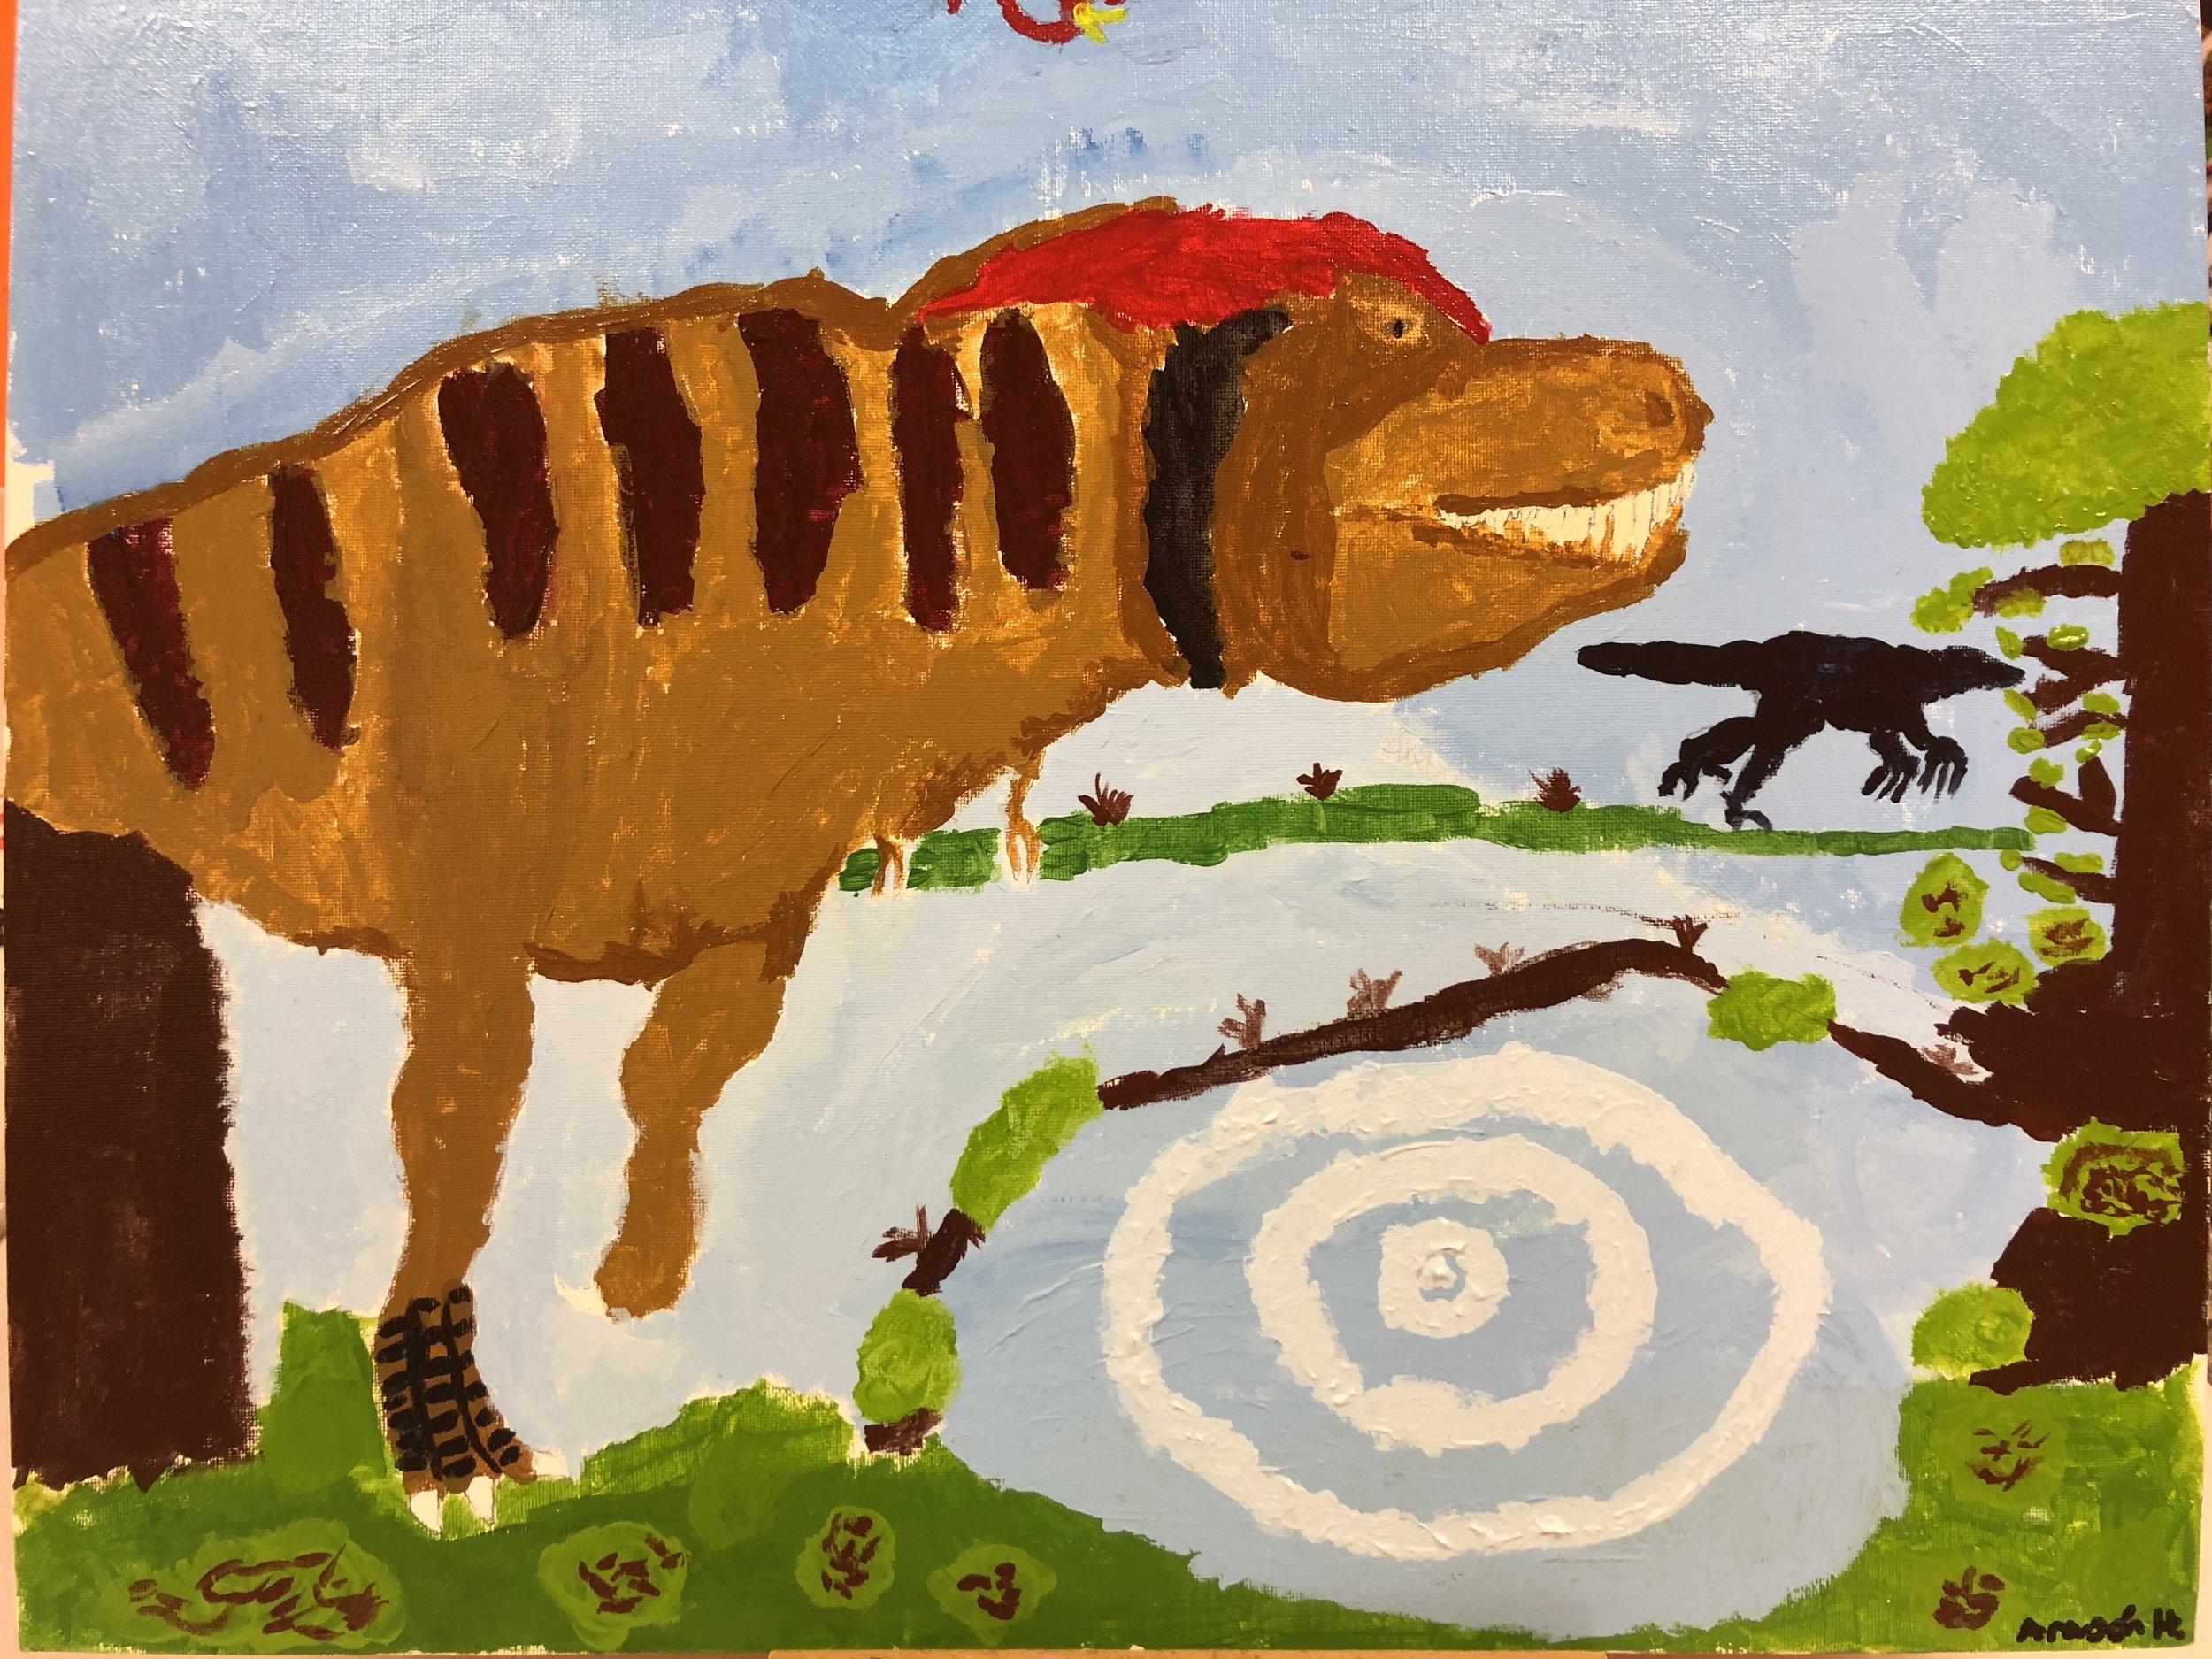 T-Rex in Acrylics  By Aragon